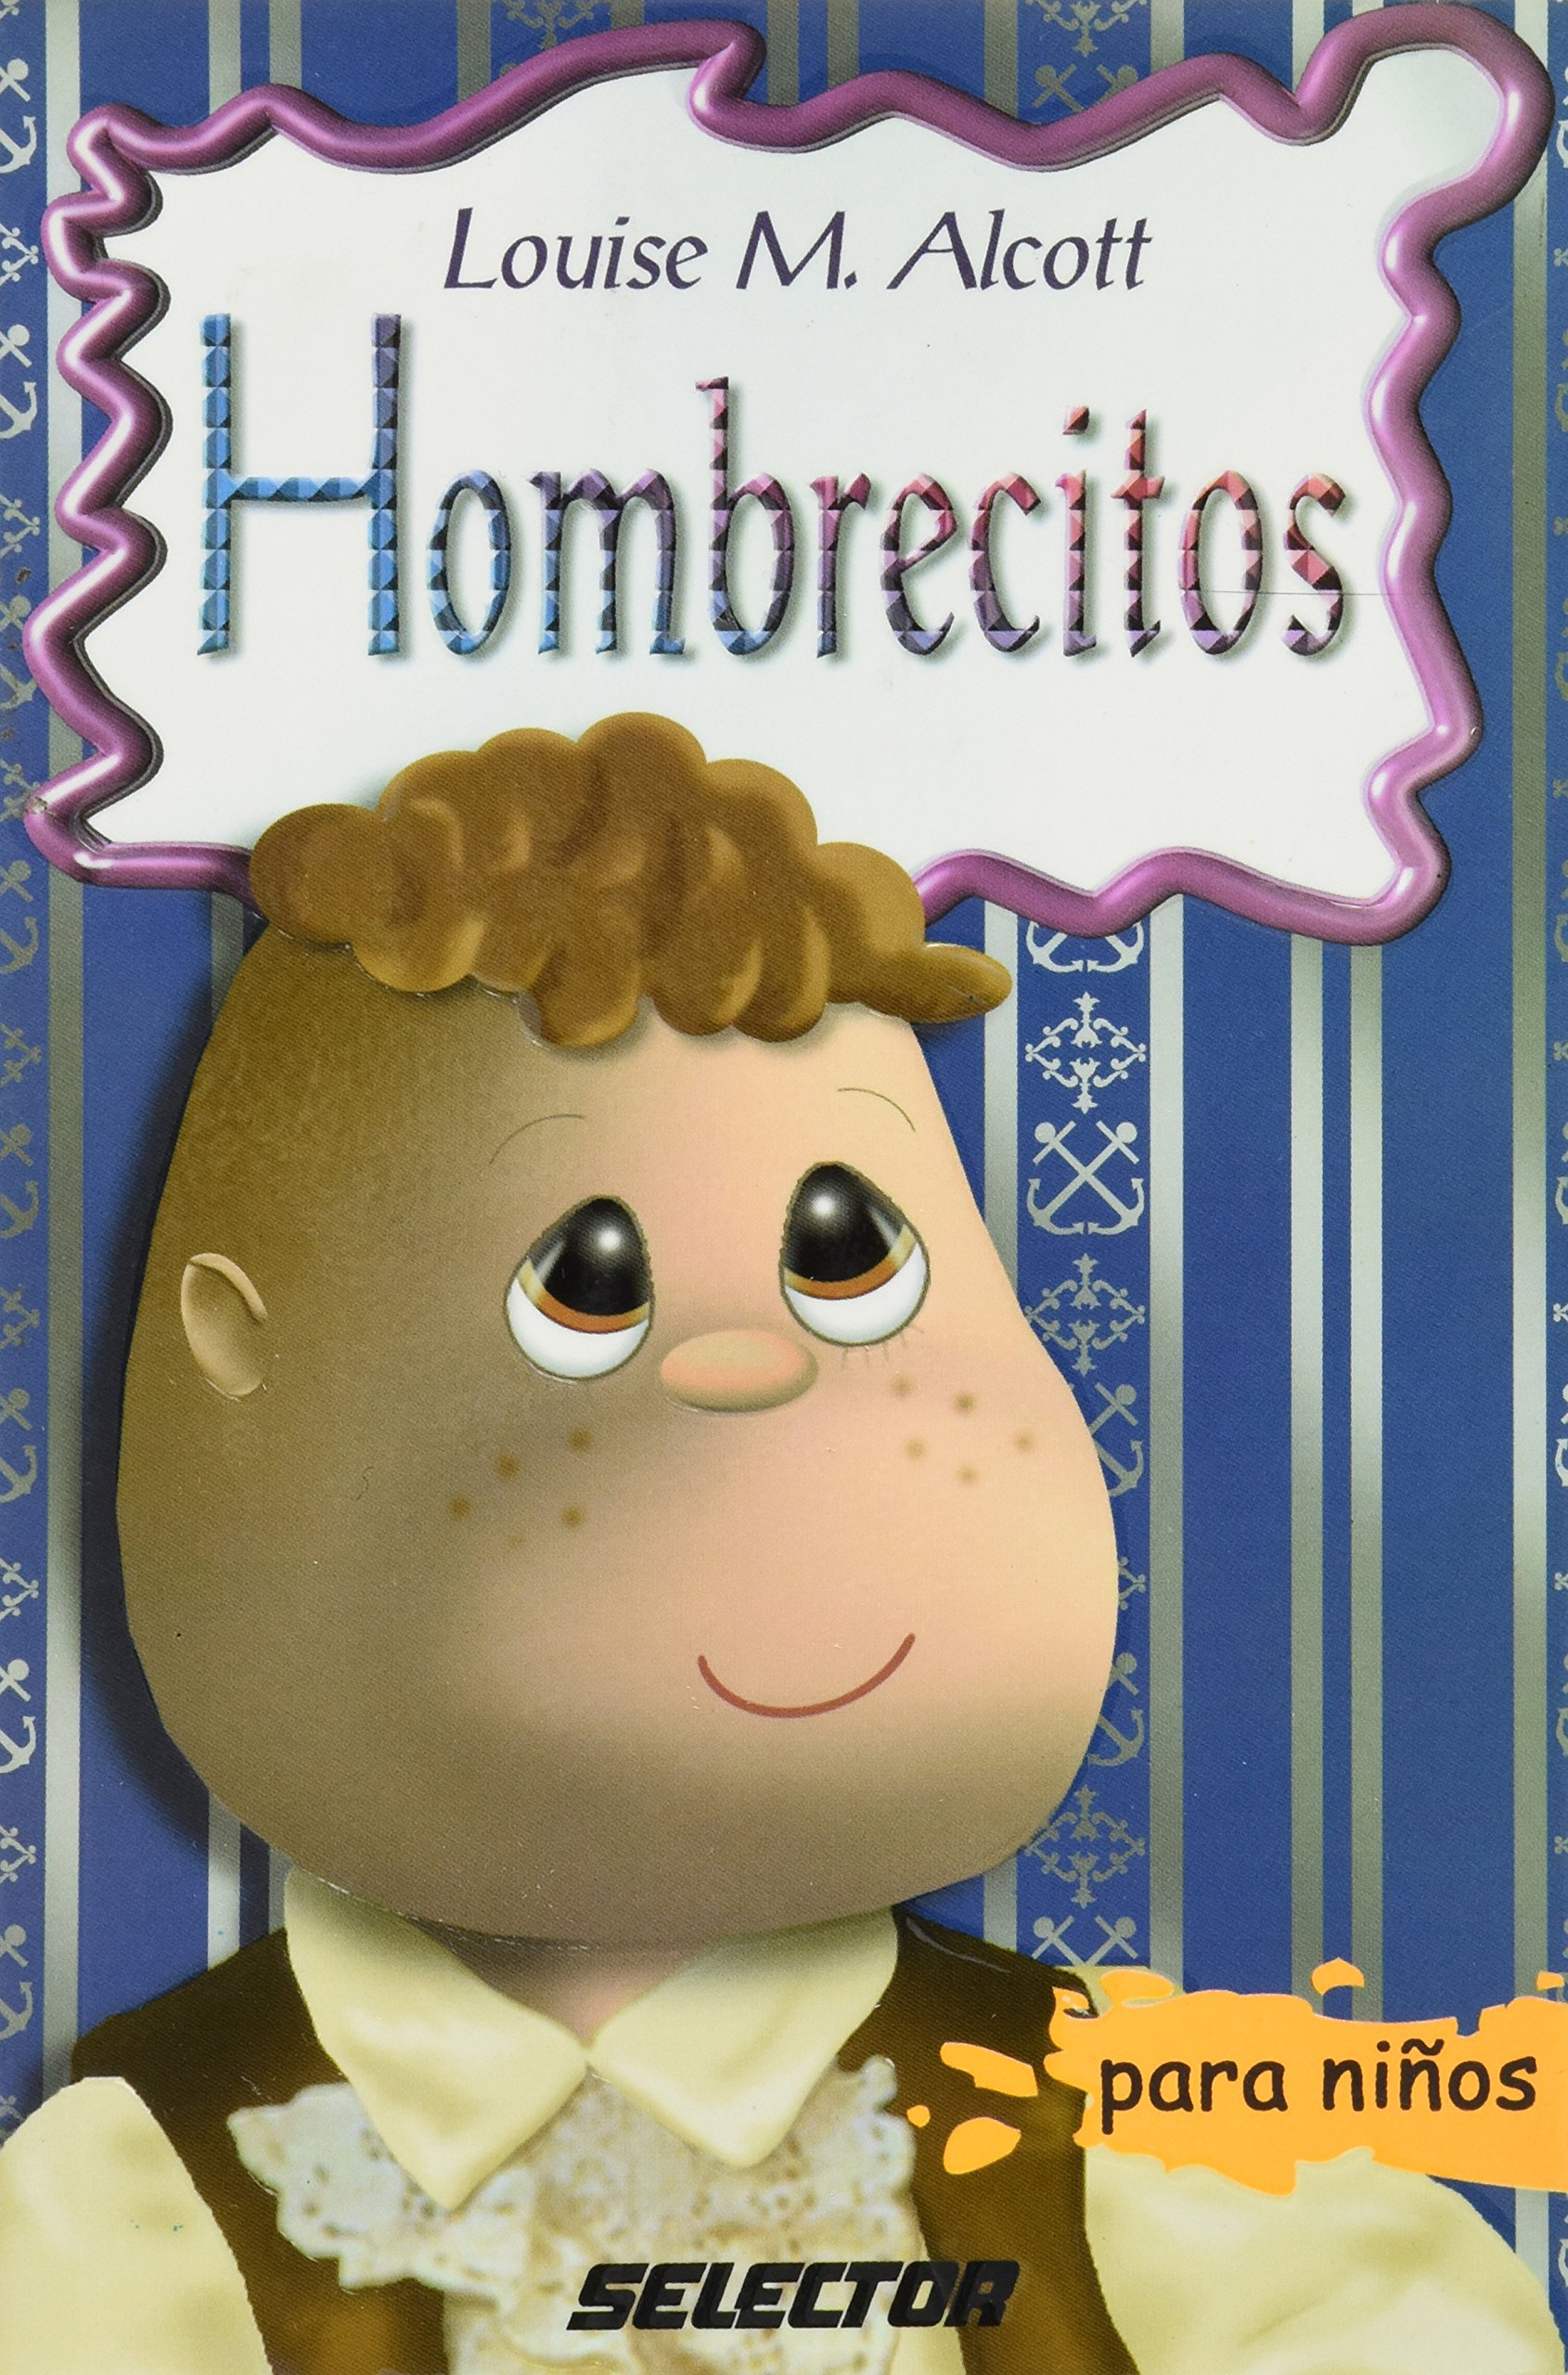 Hombrecitos para niños (Clasicos Para Ninos Classics for Children) (Spanish Edition) (Spanish) Paperback – April 15, 2002